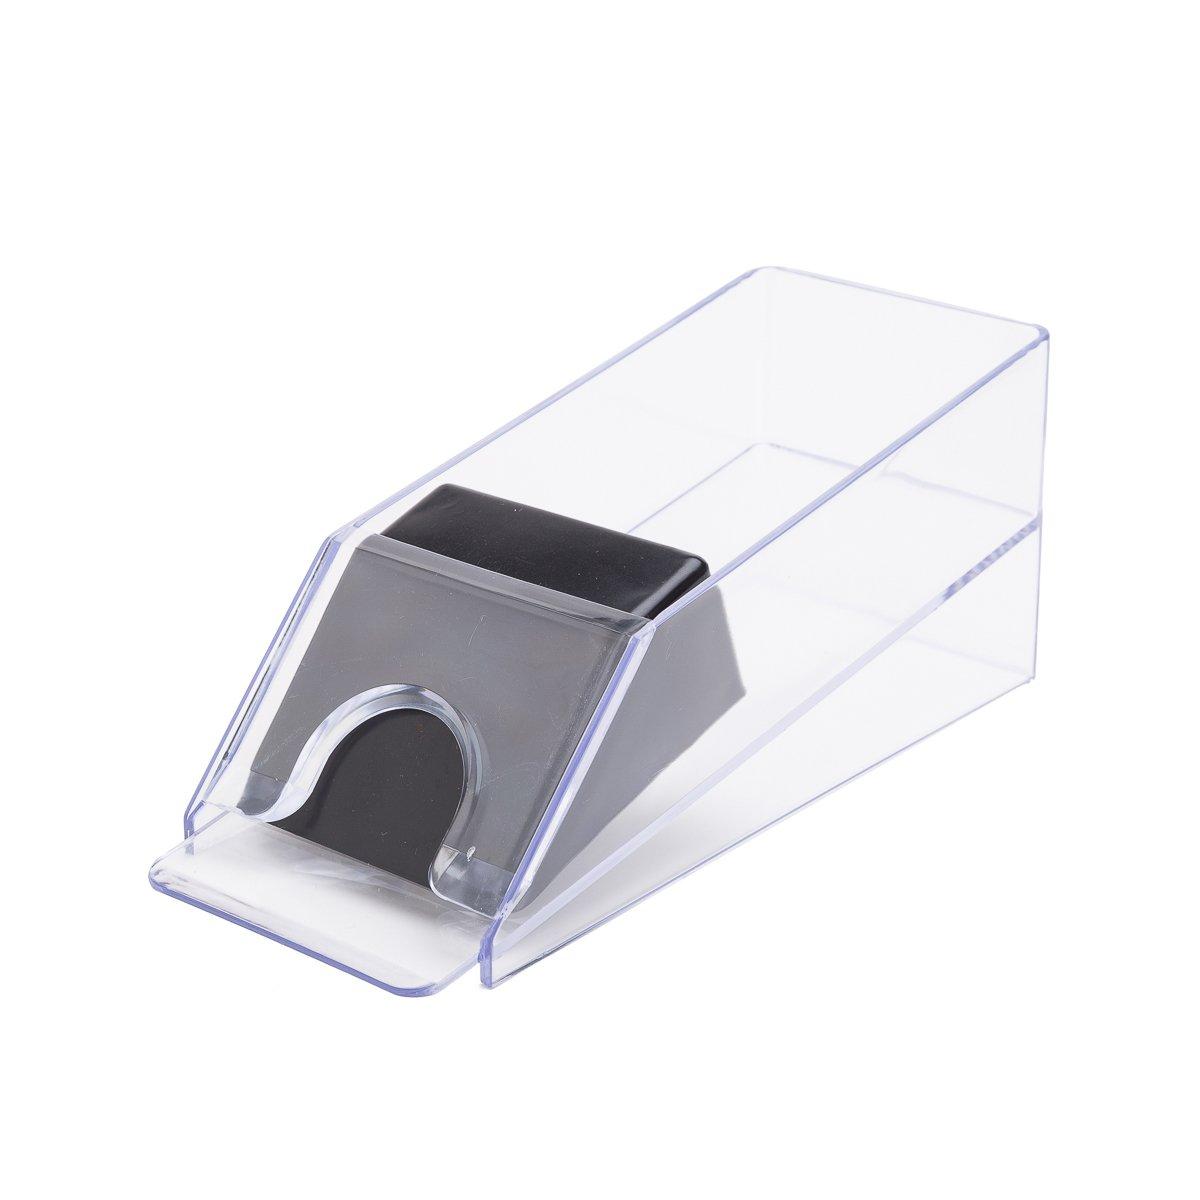 THY COLLECTIBLES 1-4 Deck Deluxe Acrylic Card Dealing Shoe For Poker/Blackjack/Casino Card Games